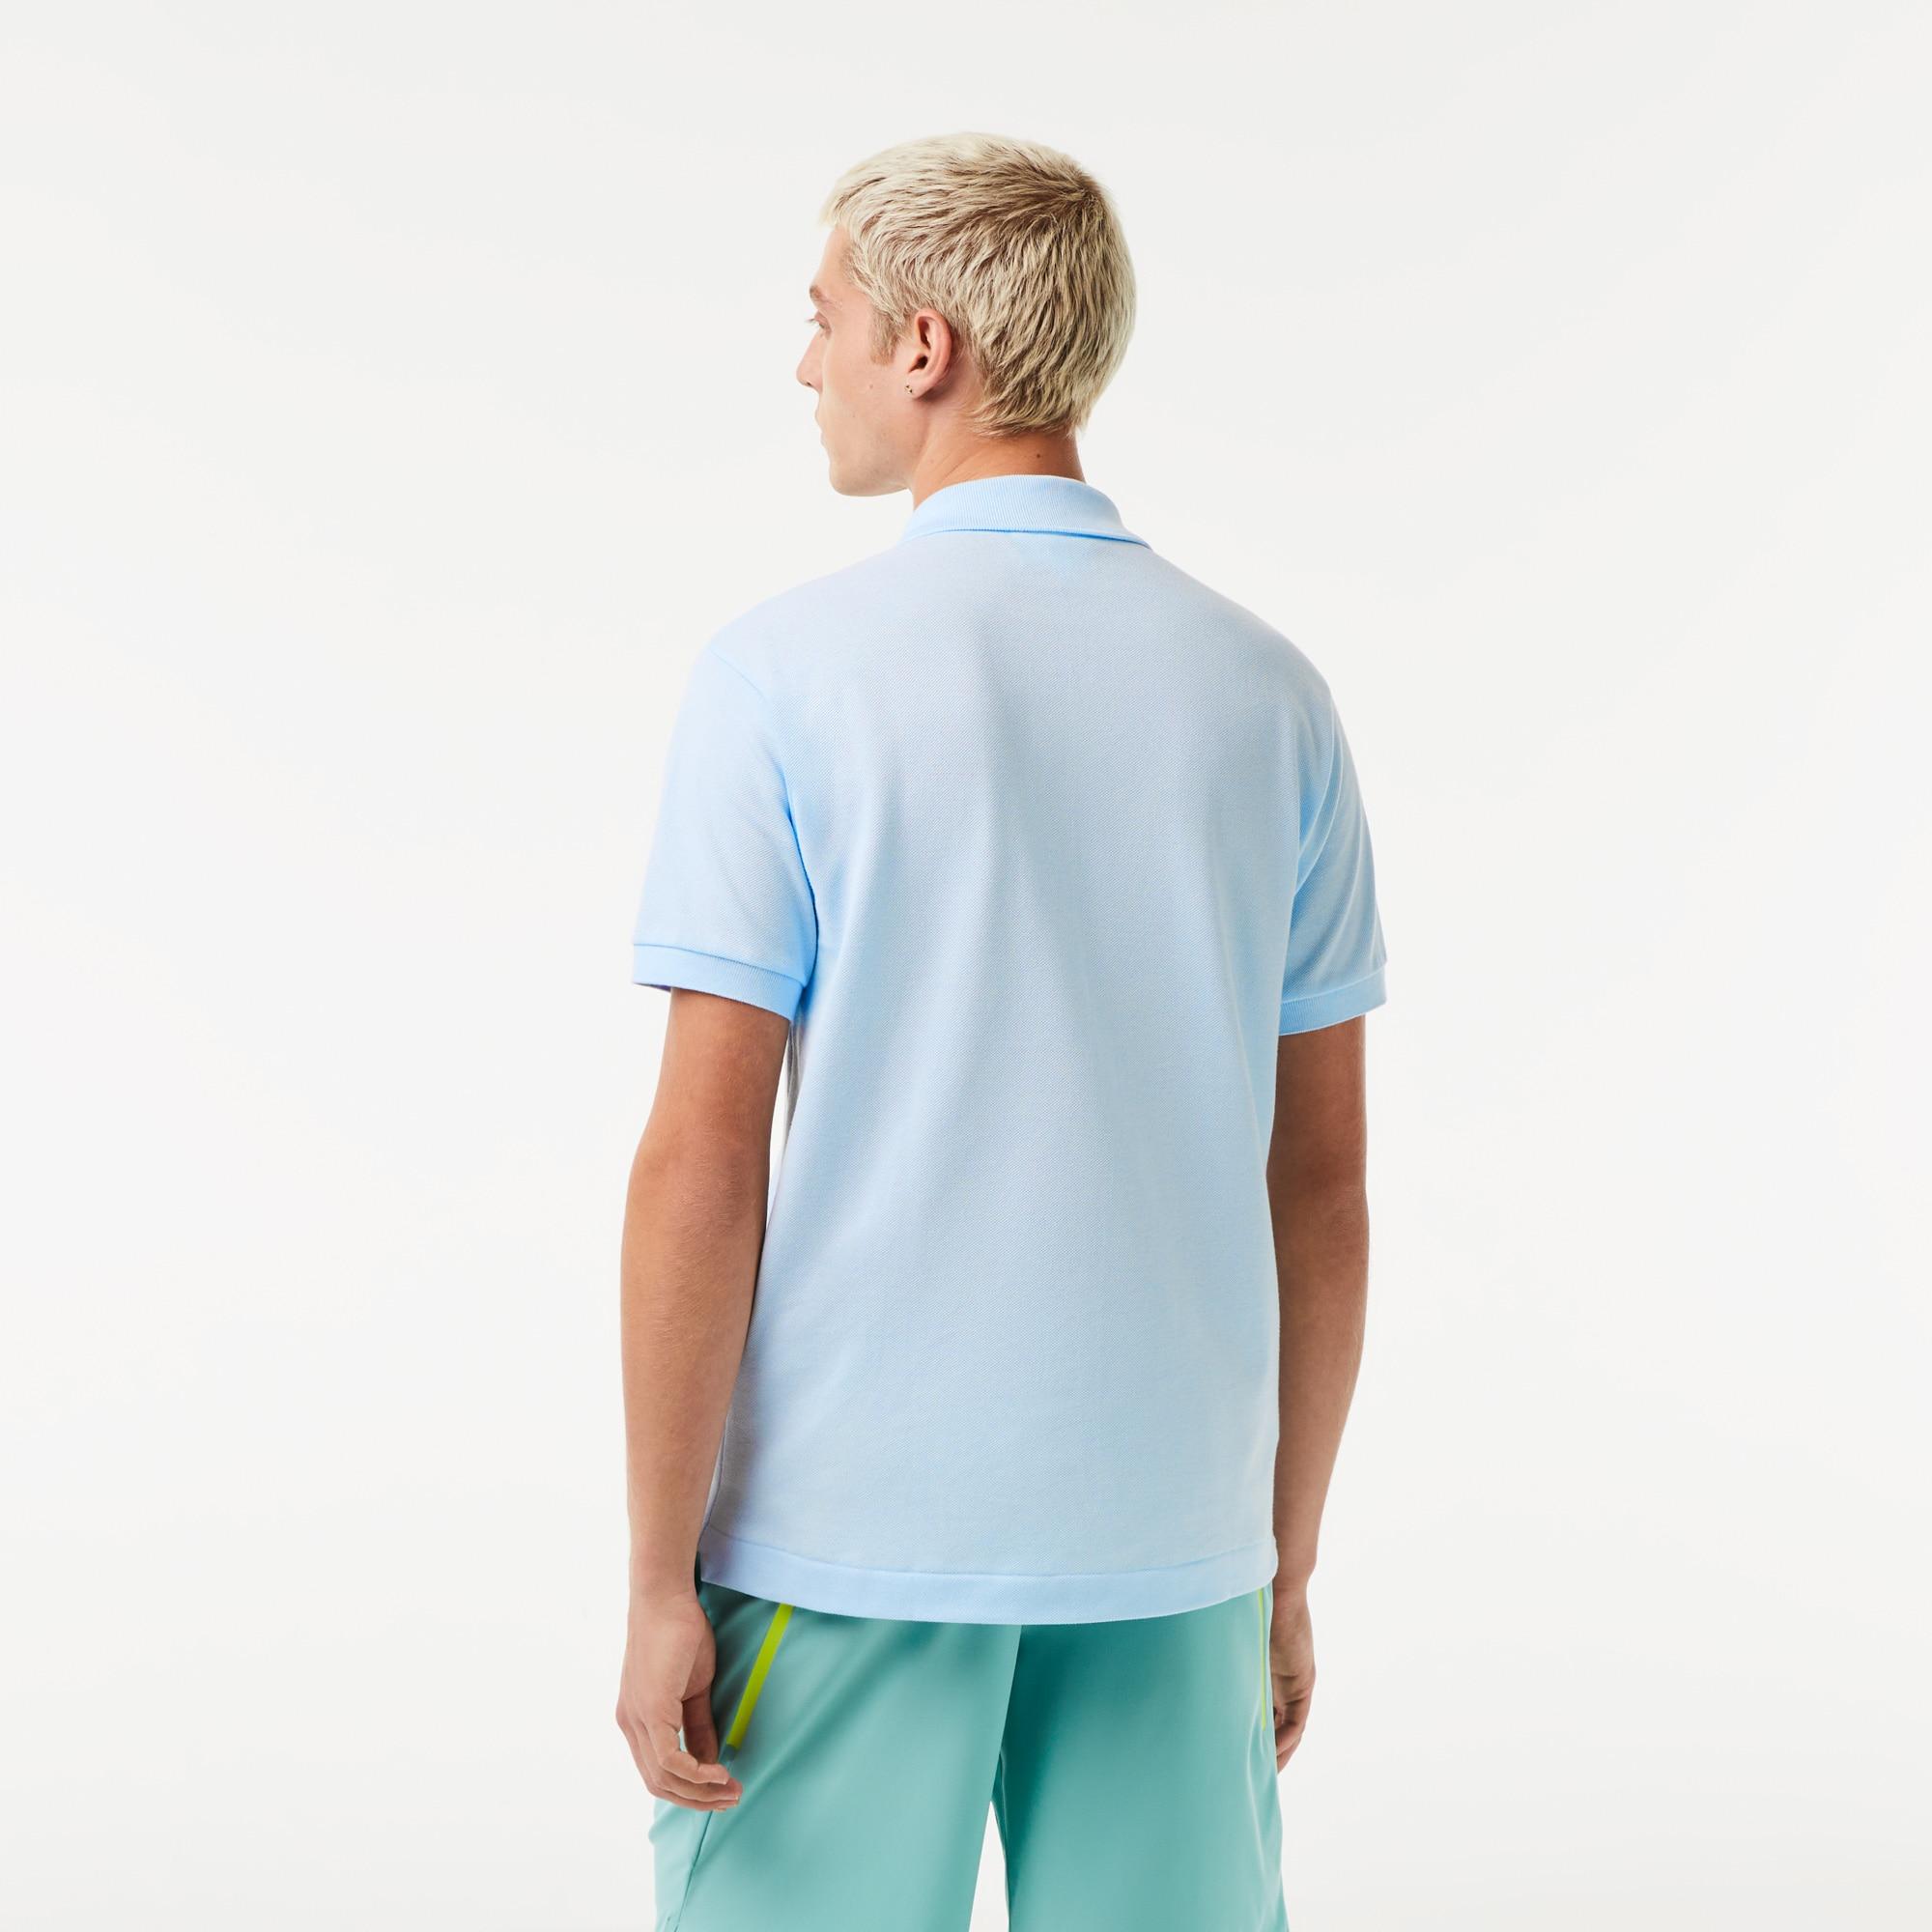 Uneek New Mens /& Womens Classic Polo Shirt Casual Sports Size XS 6XL Poloshirt